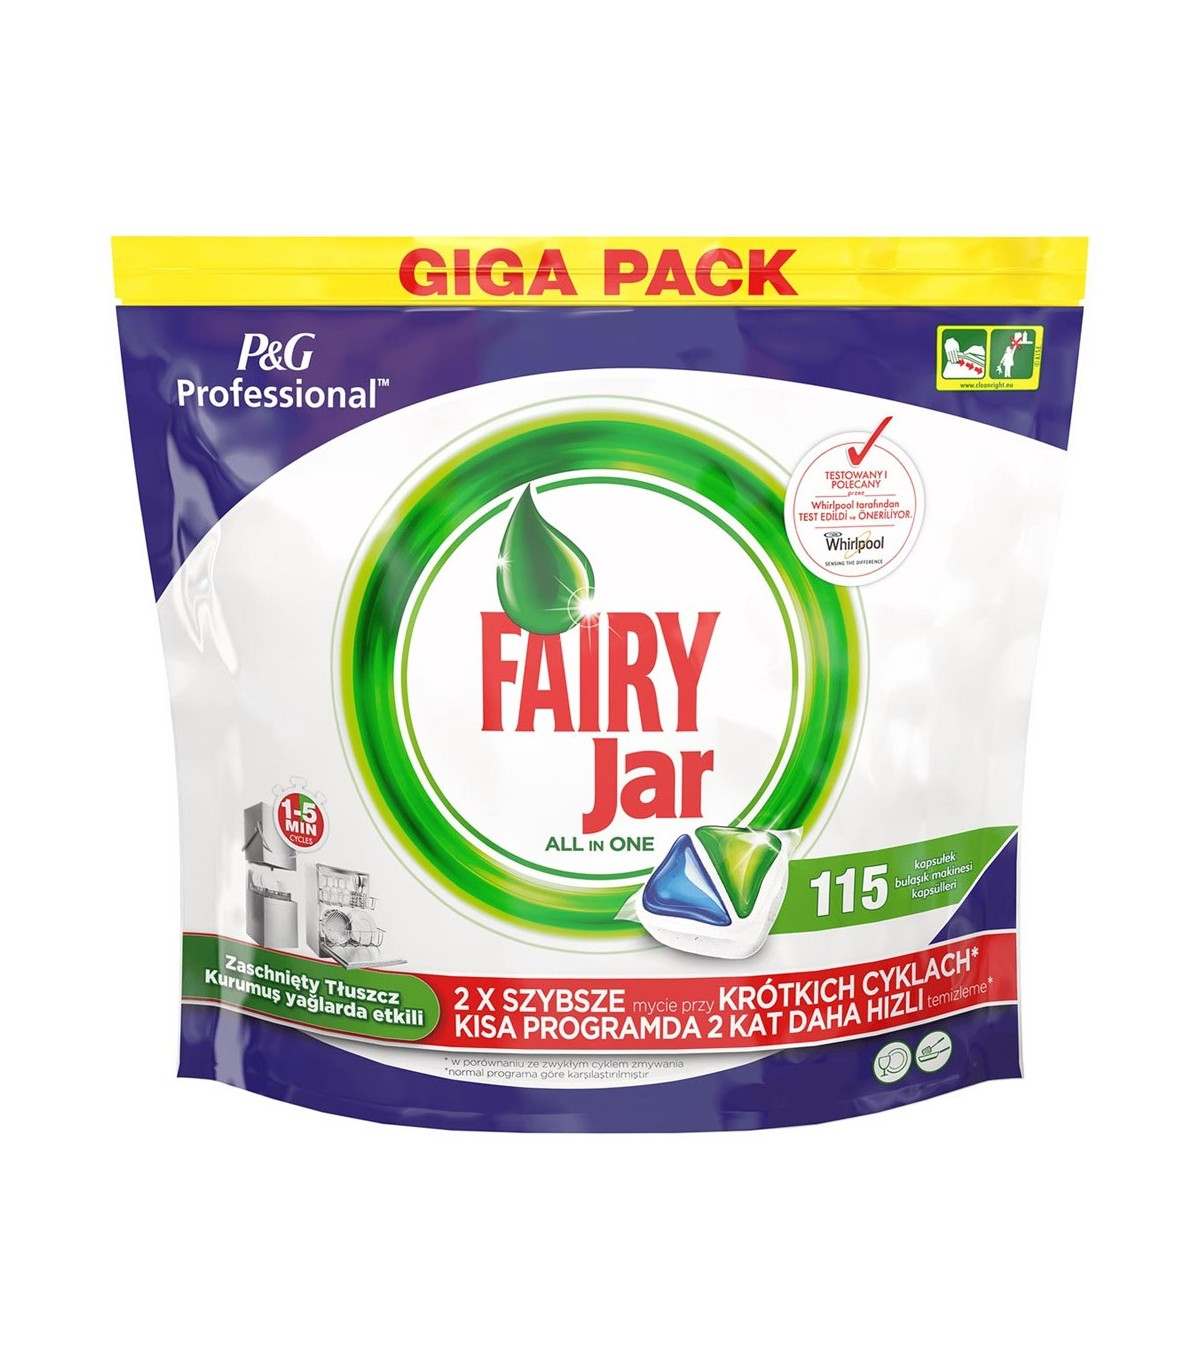 Fairy قرص ماشین ظرفشویی همه کاره جار 115 عددی فیری